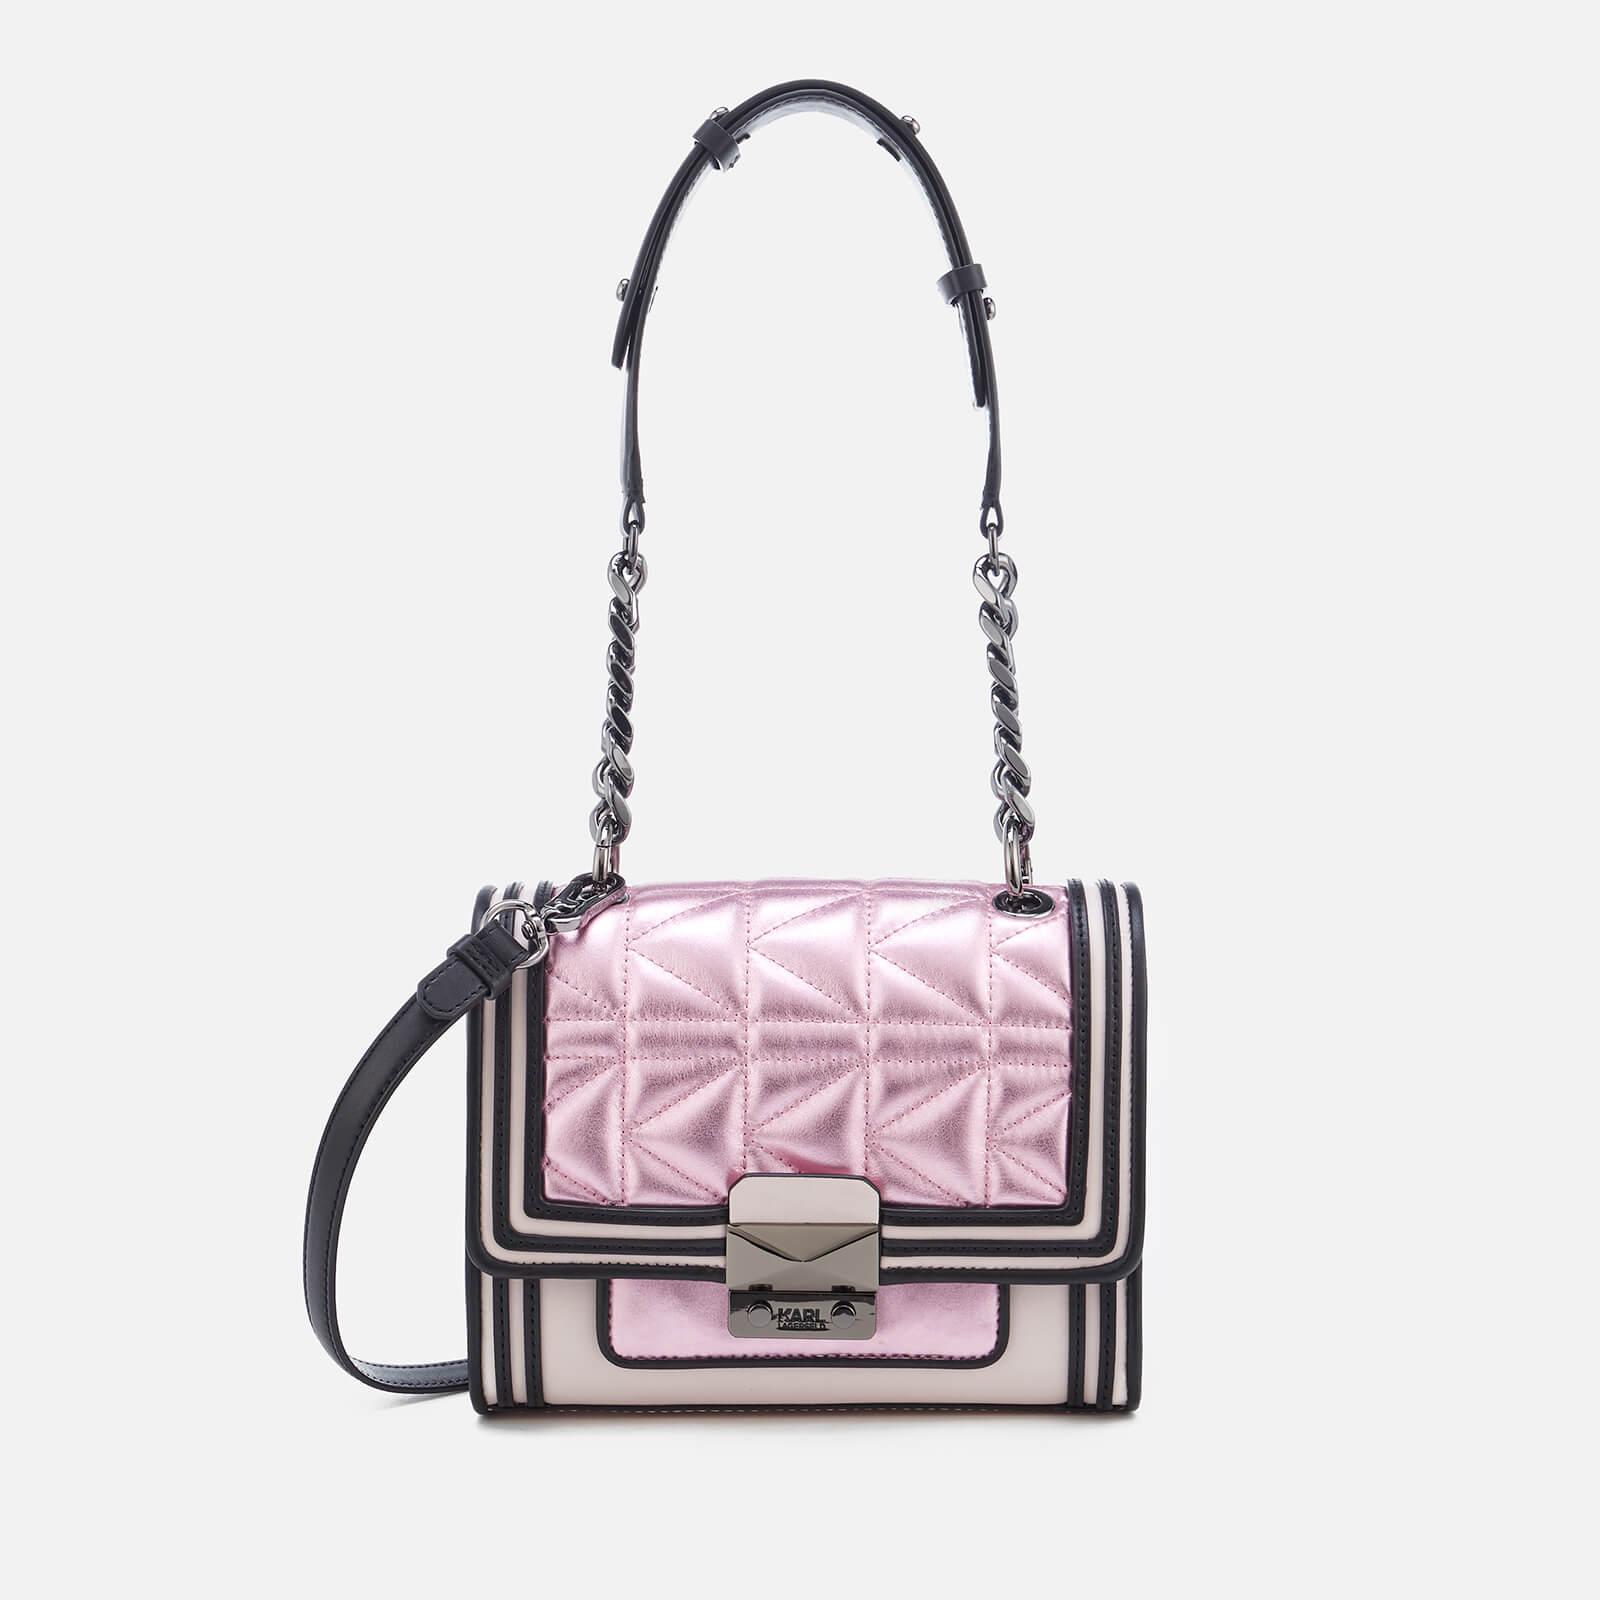 c51171edde1f Karl Lagerfeld Women s K Kuilted Pink Mini Handbag - Metallic Pink - Free  UK Delivery over £50